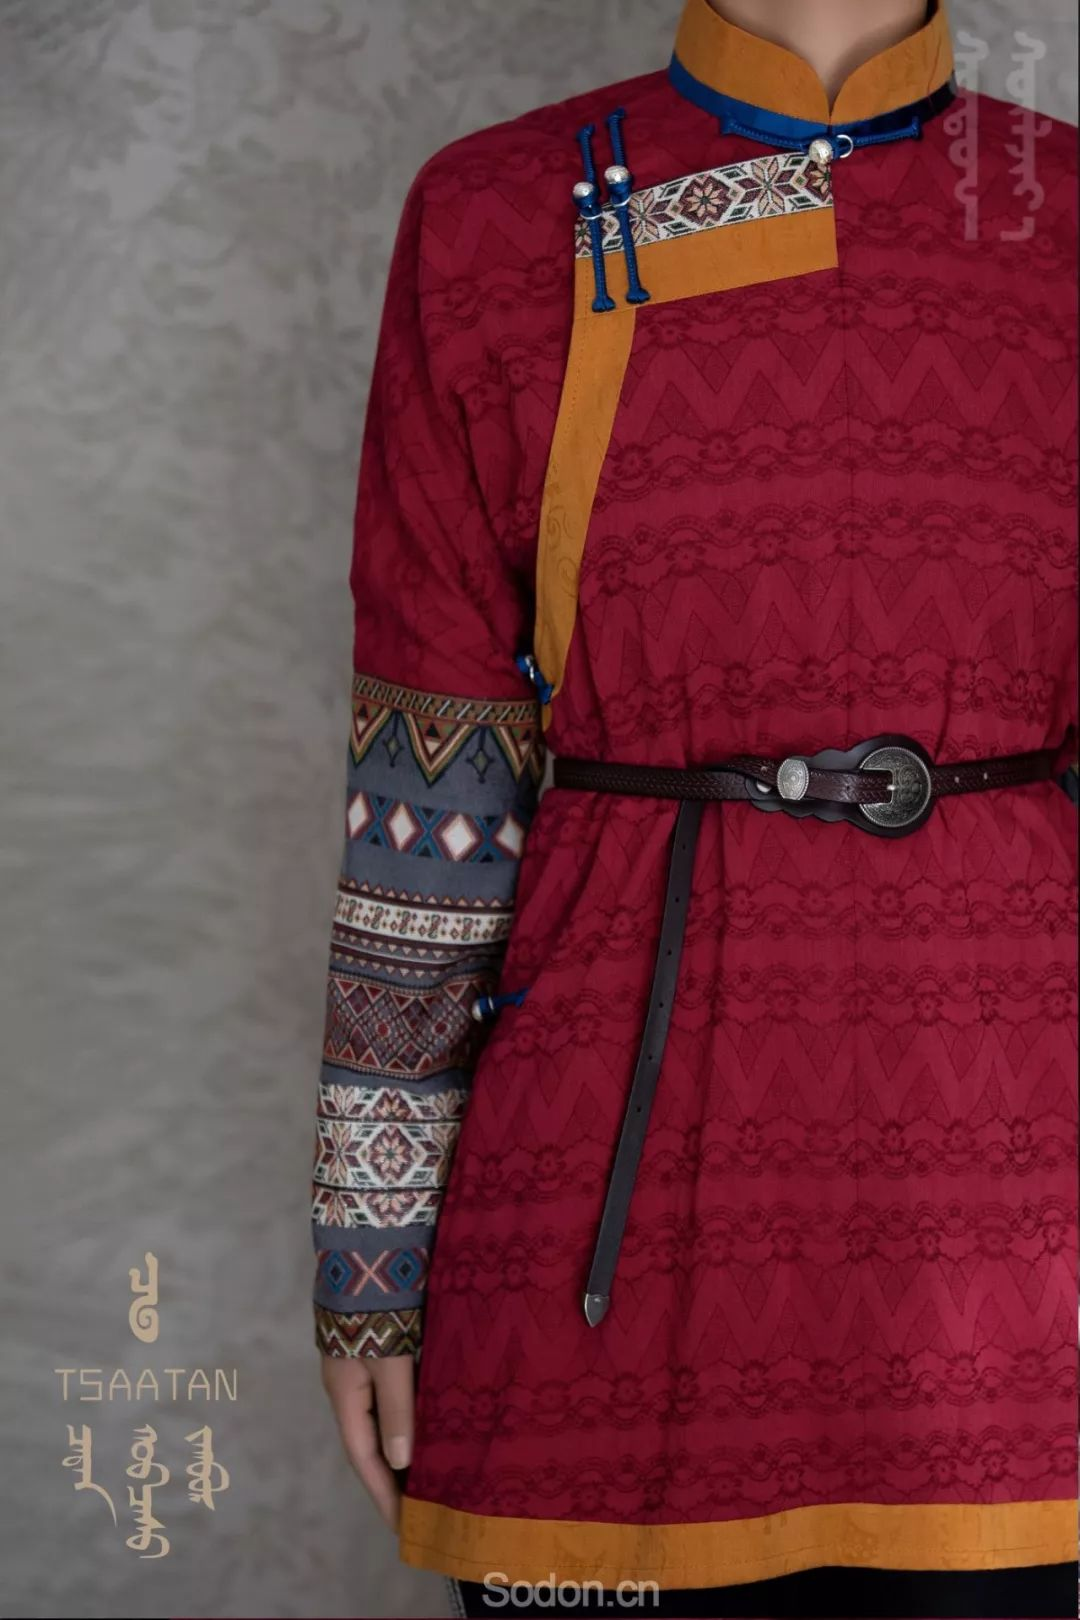 TSAATAN蒙古时装秋冬系列,来自驯鹿人的独特魅力! 第69张